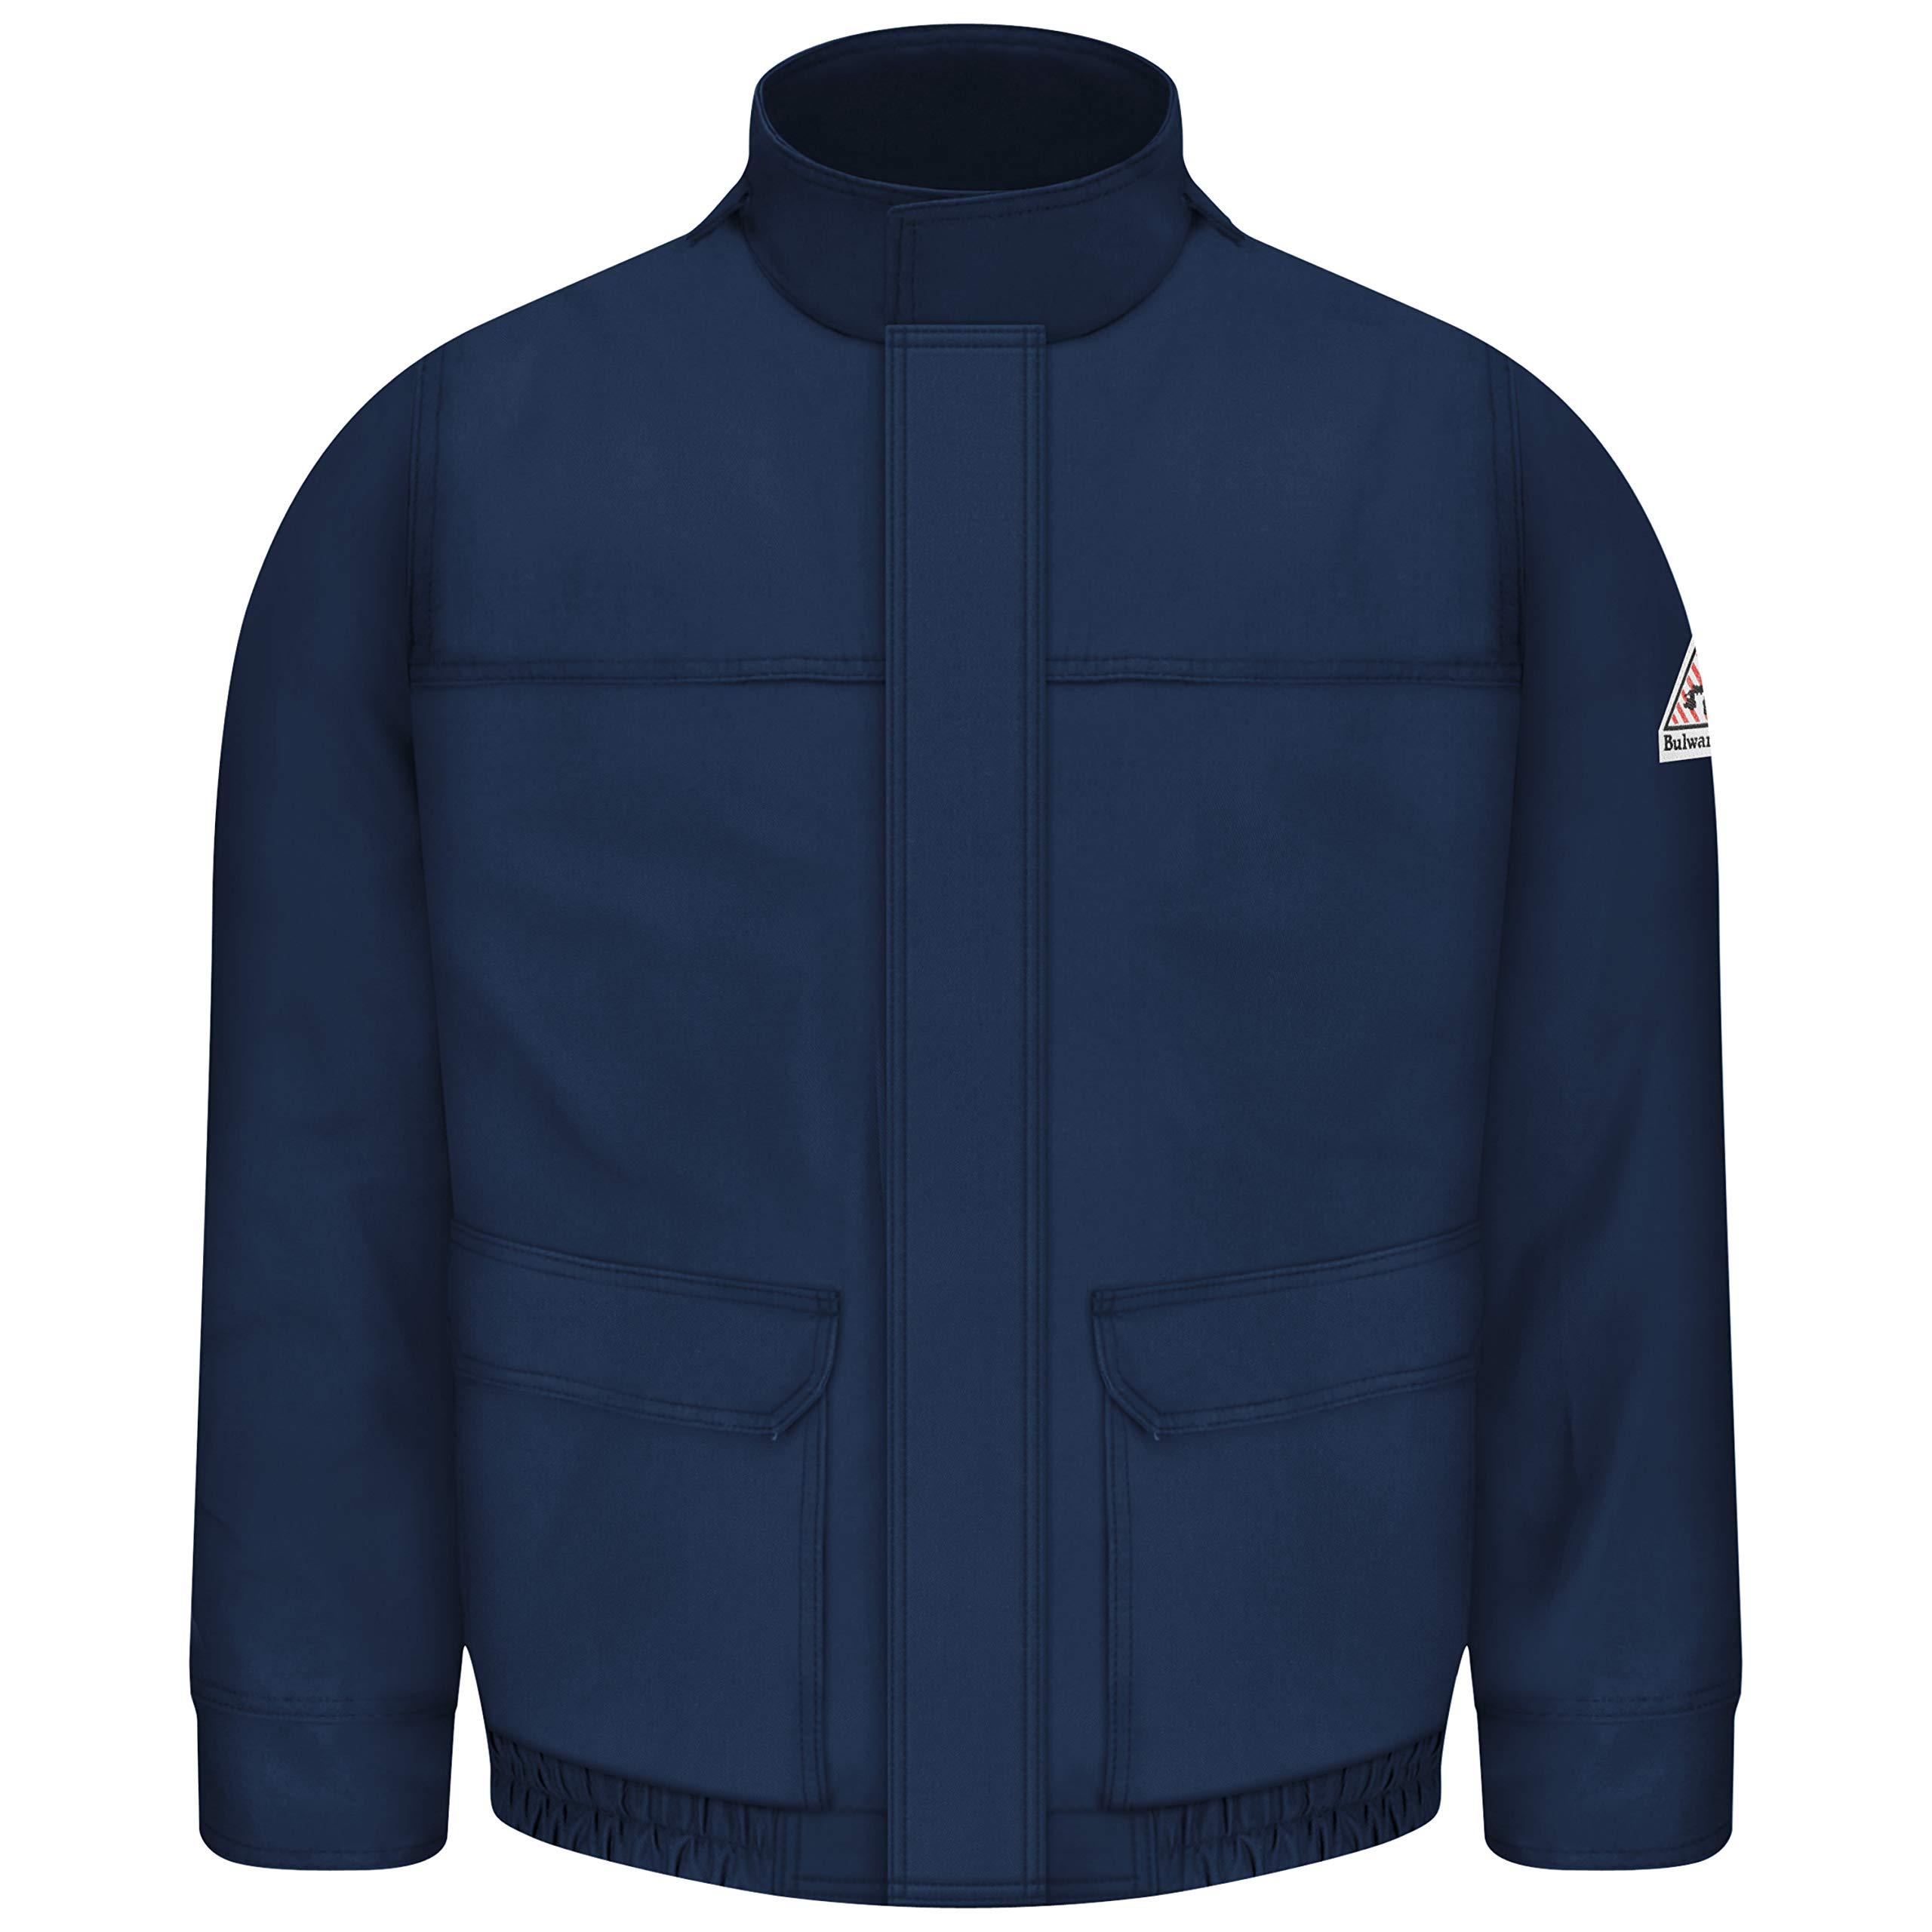 Bulwark Flame Resistant 7 oz Twill Cotton/Nylon ComforTouch Bomber Jacket